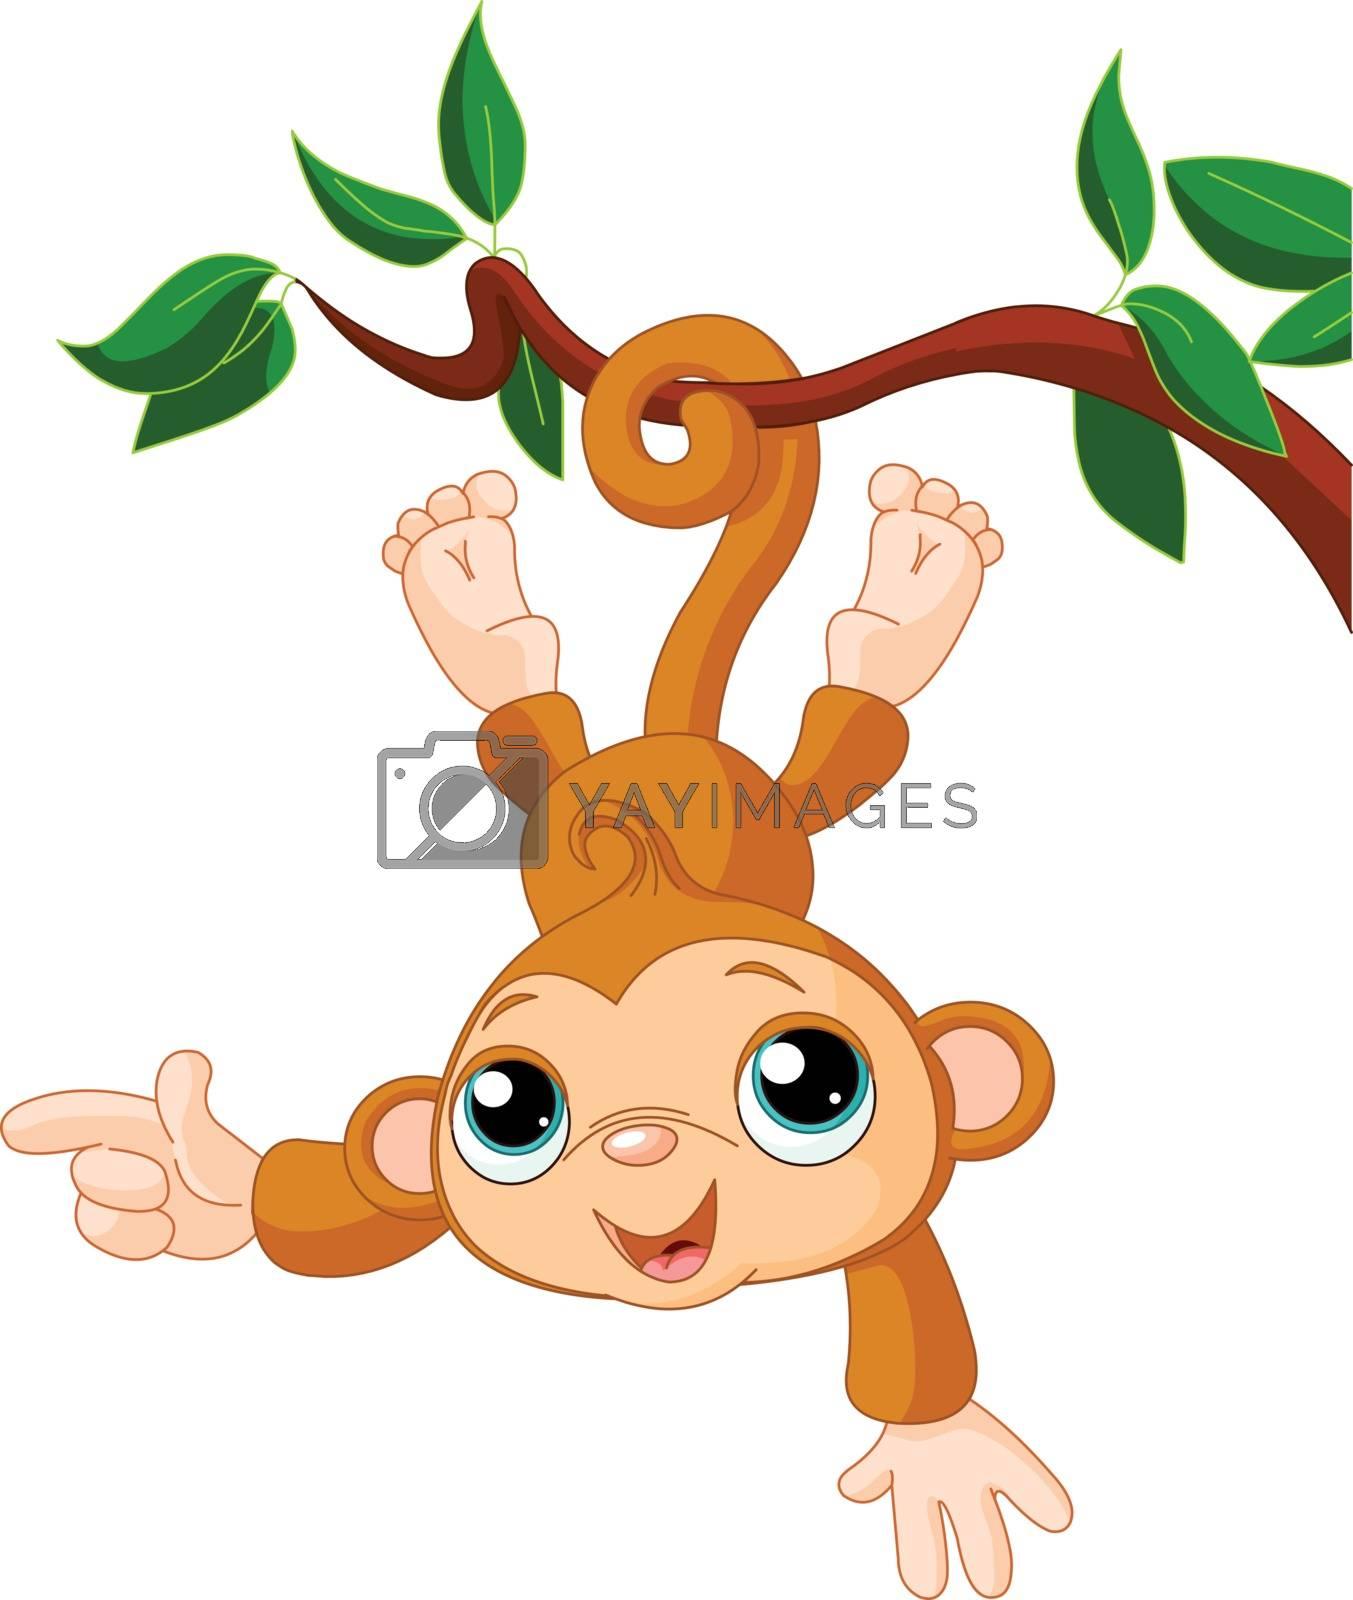 Royalty free image of Baby monkey on a tree by Dazdraperma